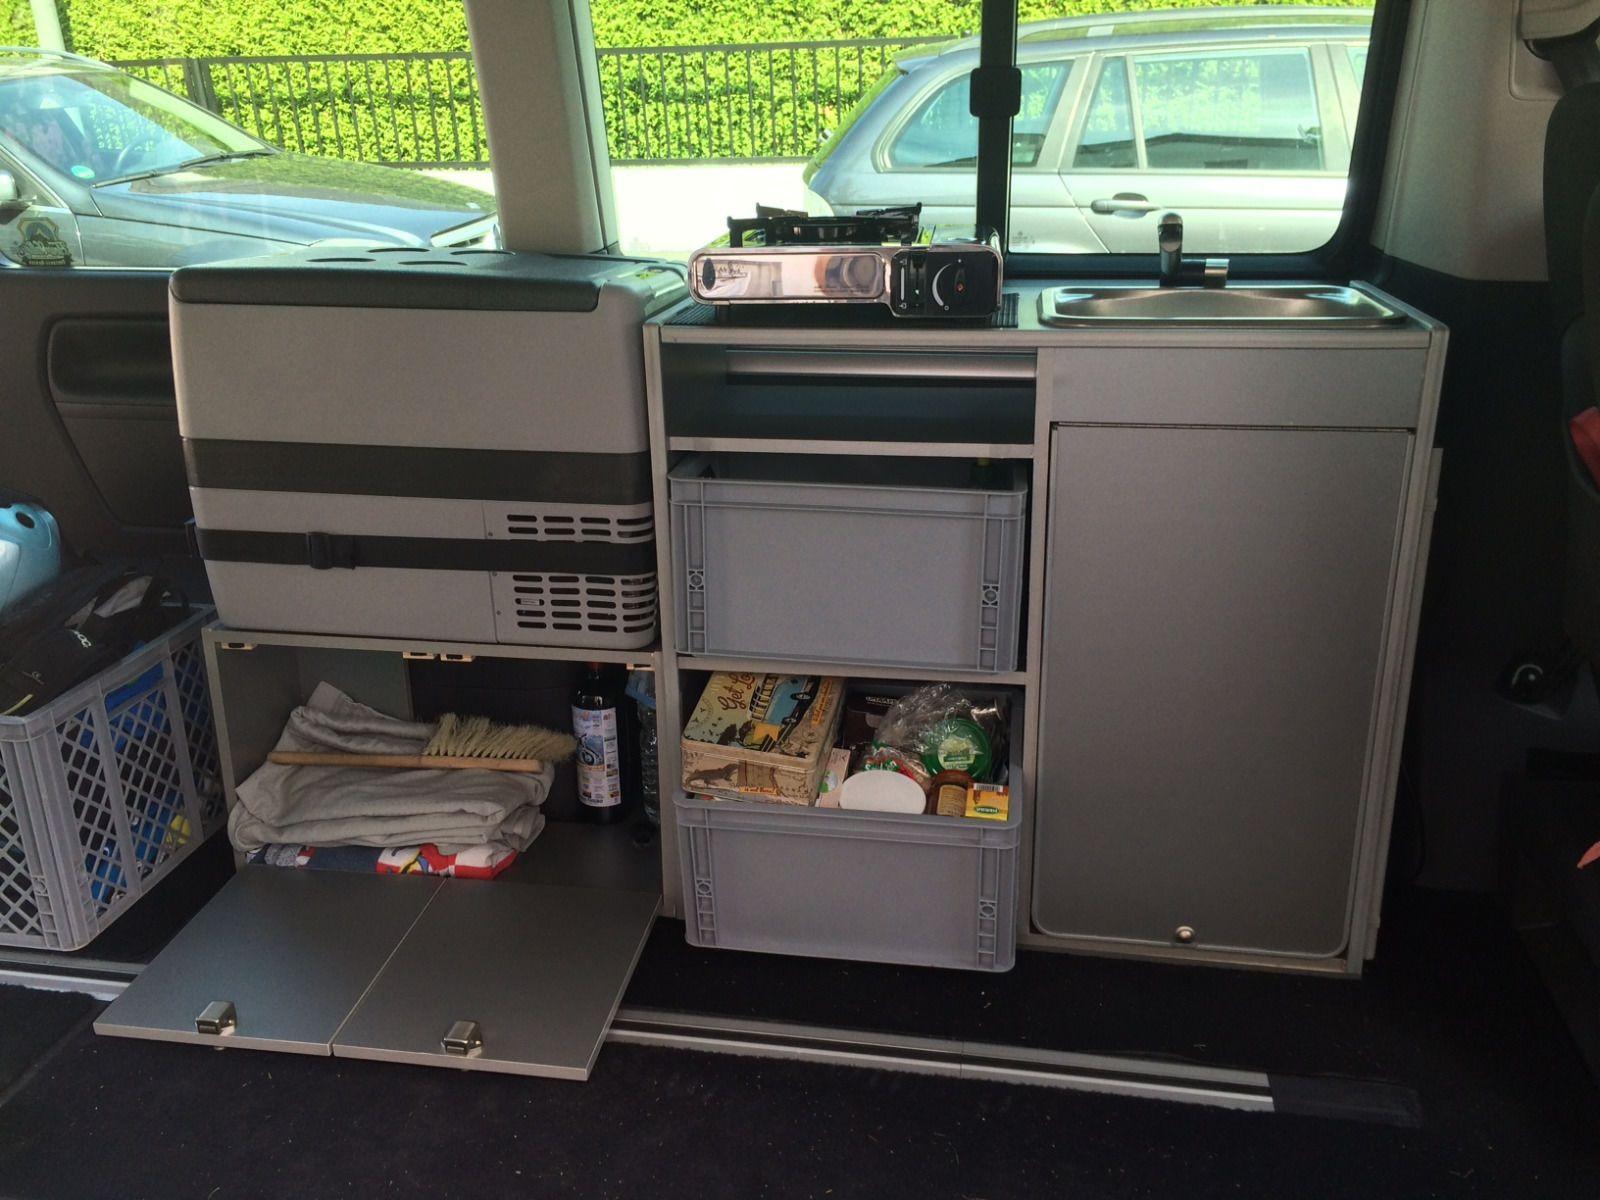 VW T5 California Beach Ausbau Küche Schrank Spüle Eigenbau nach ...